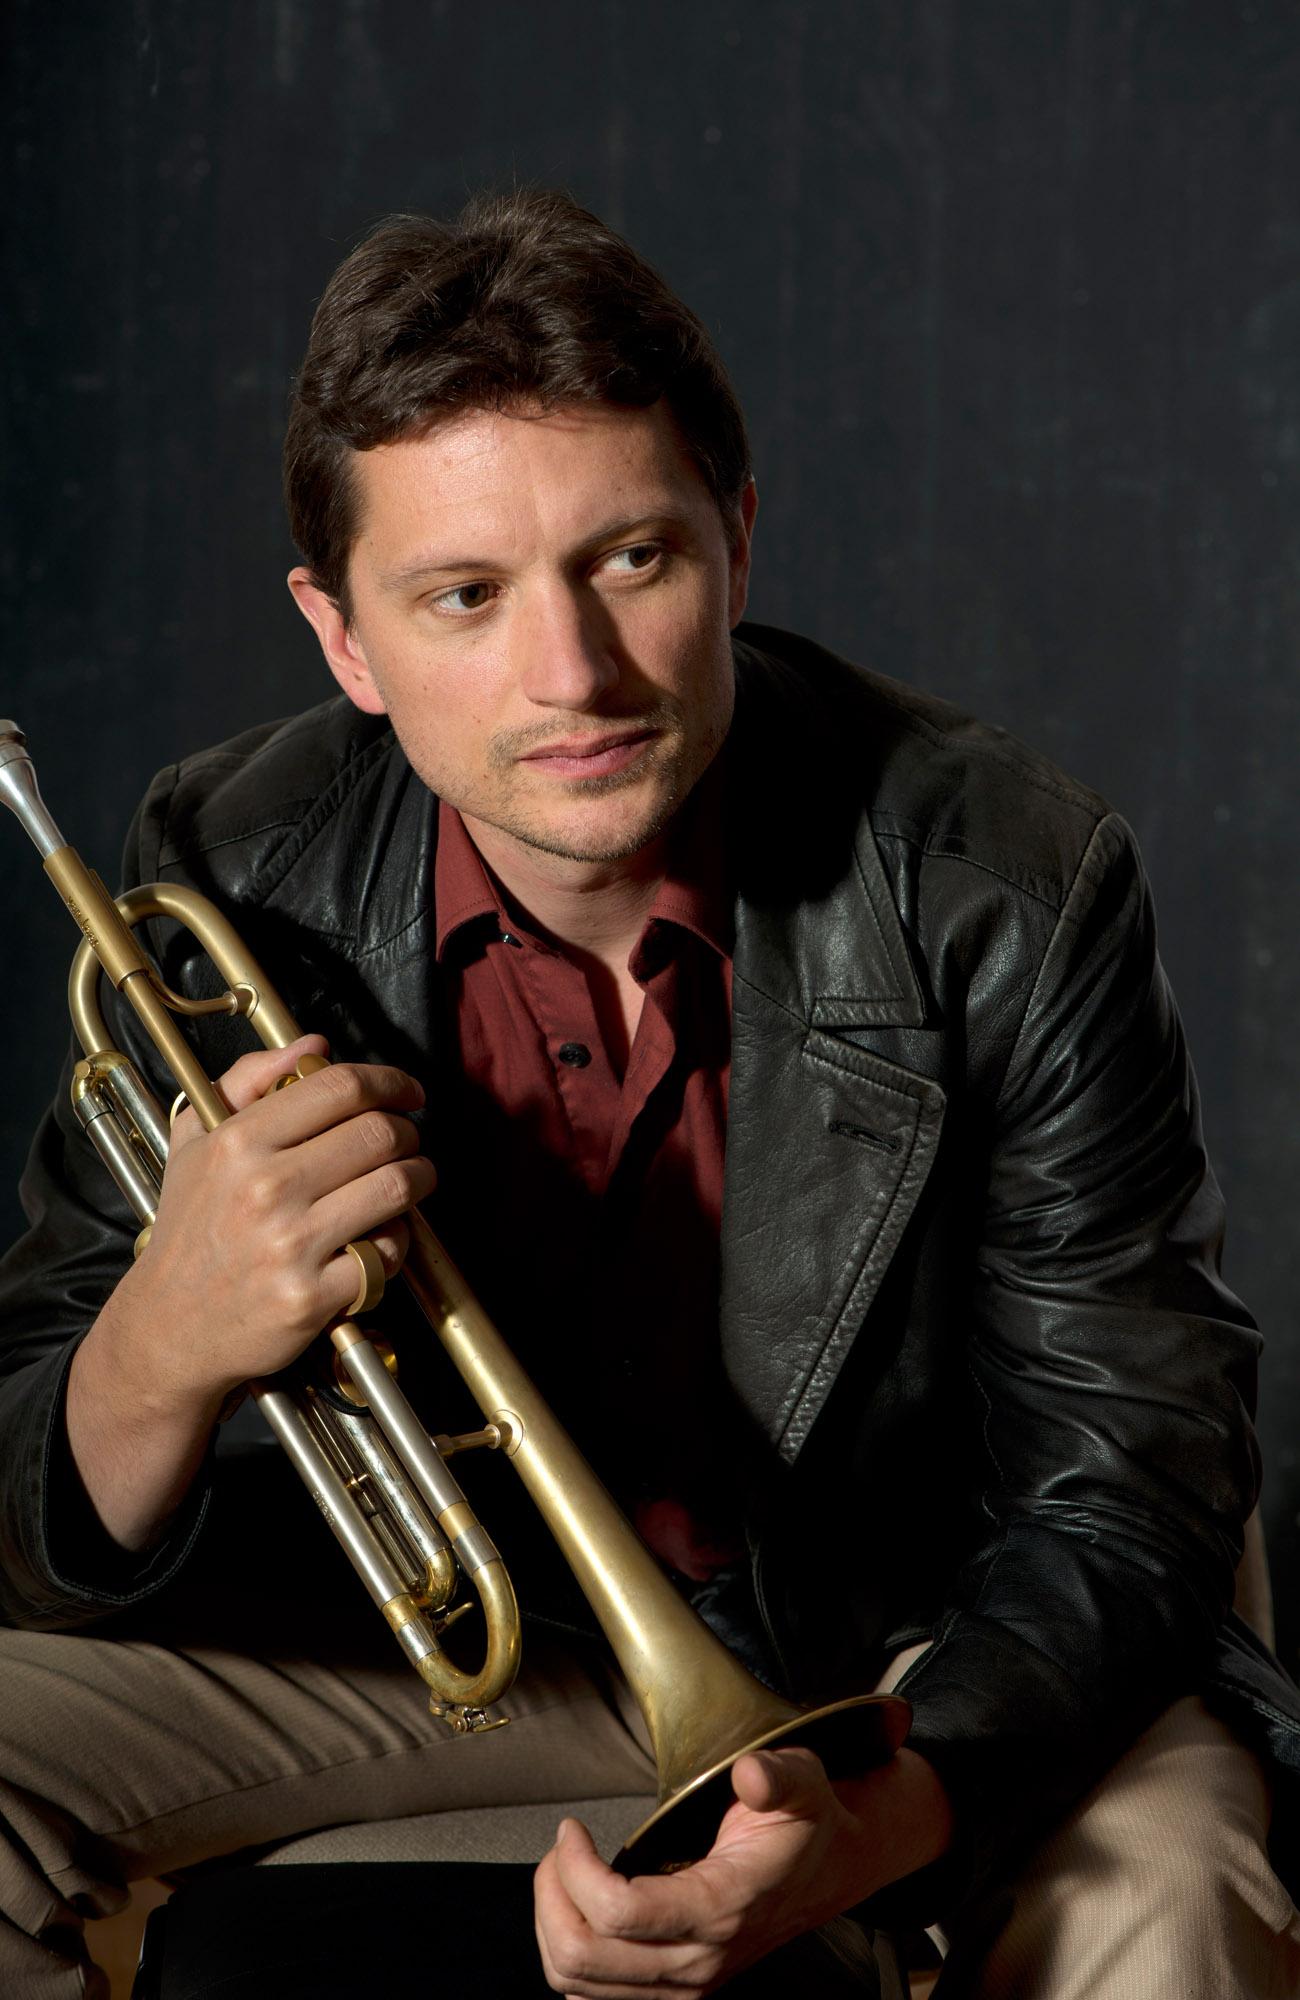 Matthias Spillmann